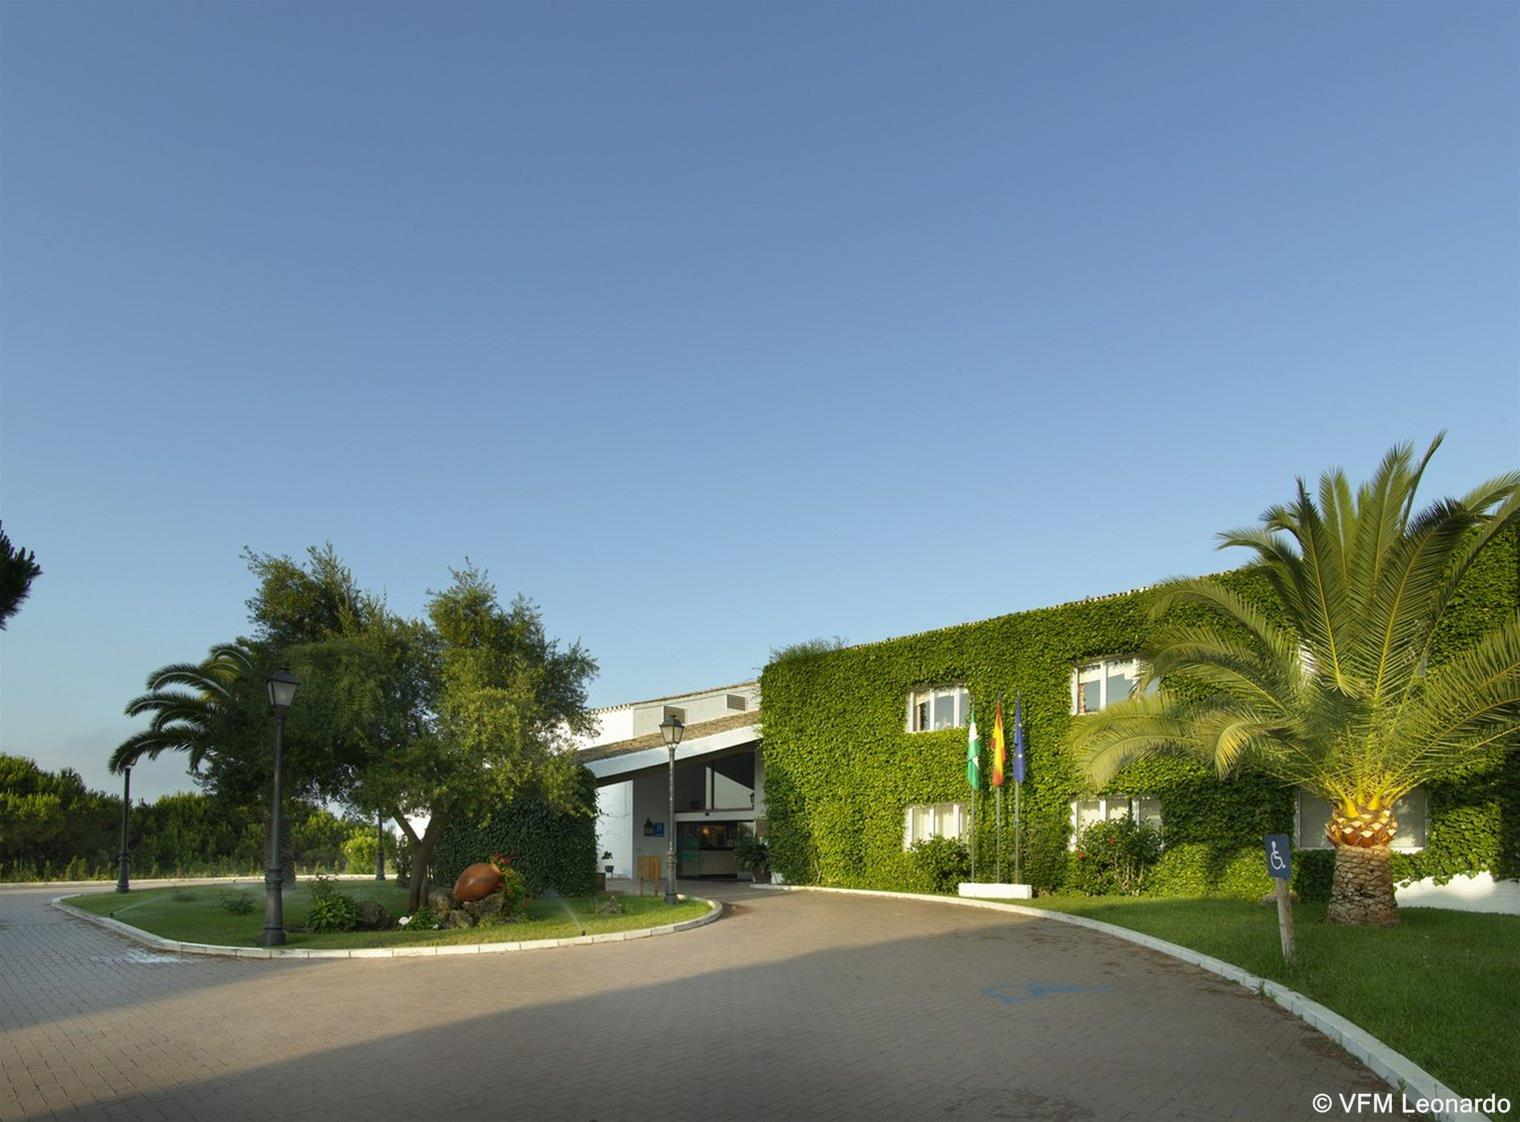 Chollos viajes ultimo minuto a Hoteles en Parque Nacional De Doñana